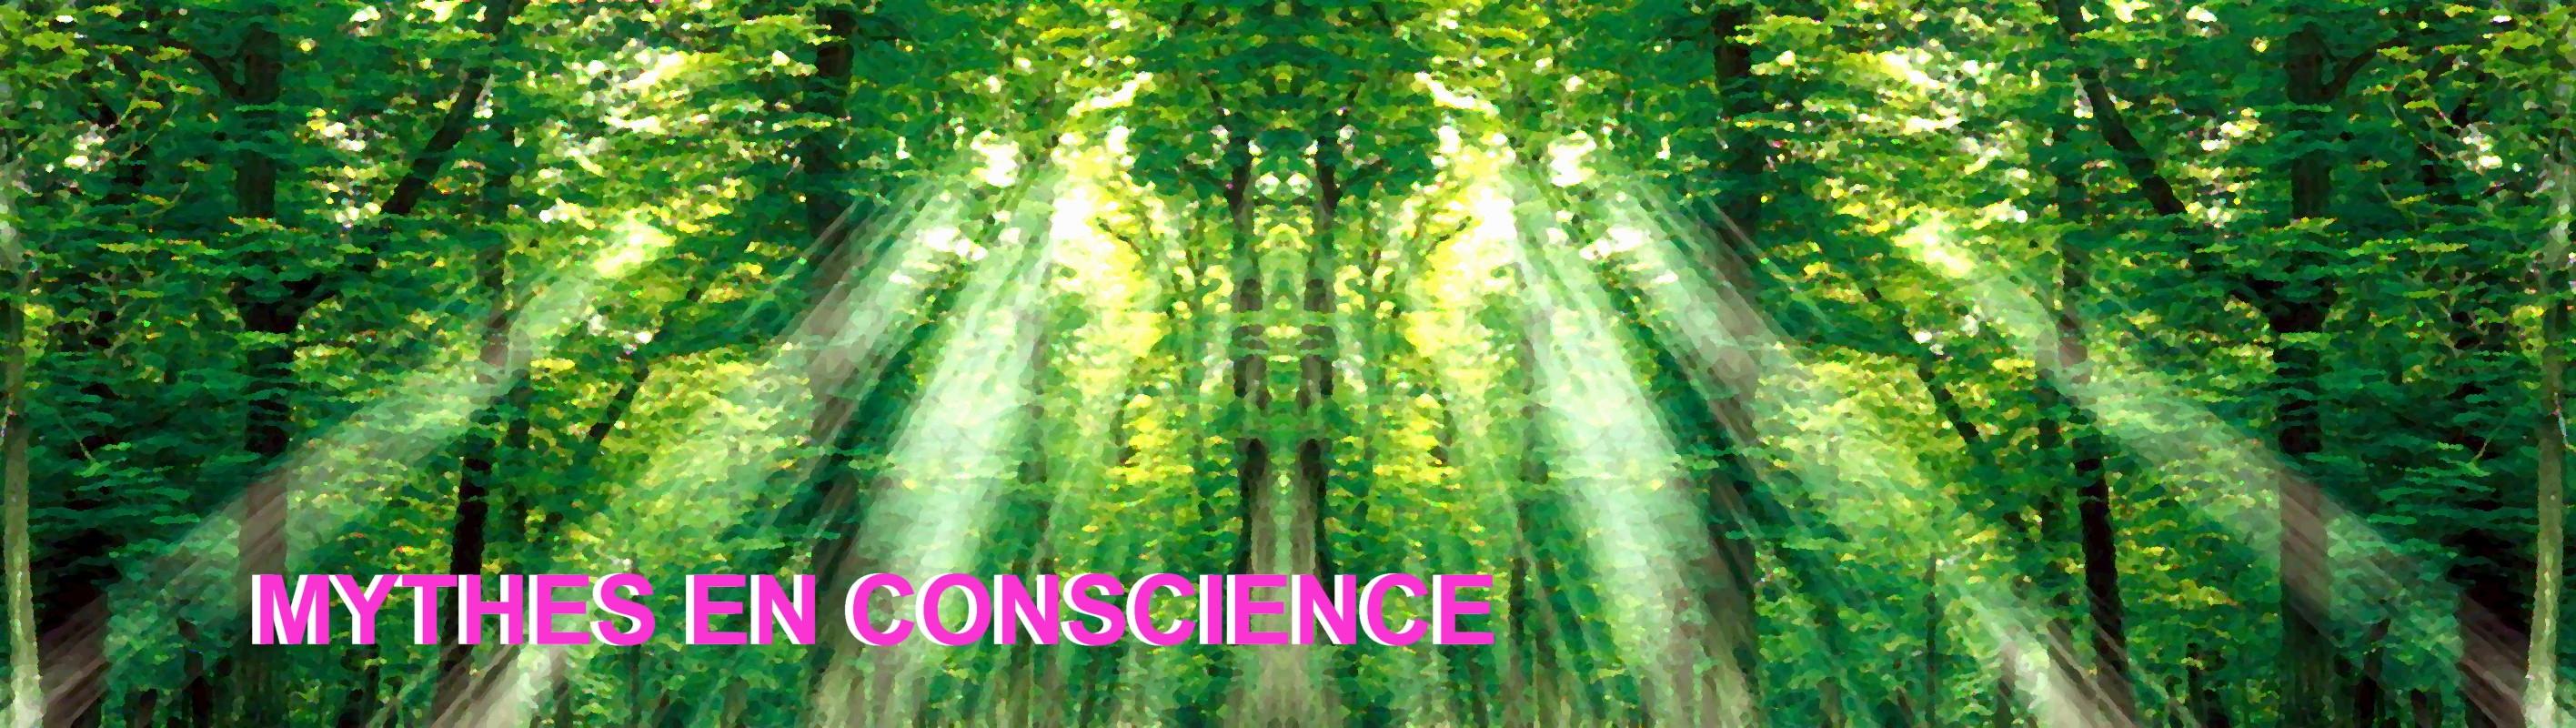 MYTHES EN CONSCIENCE